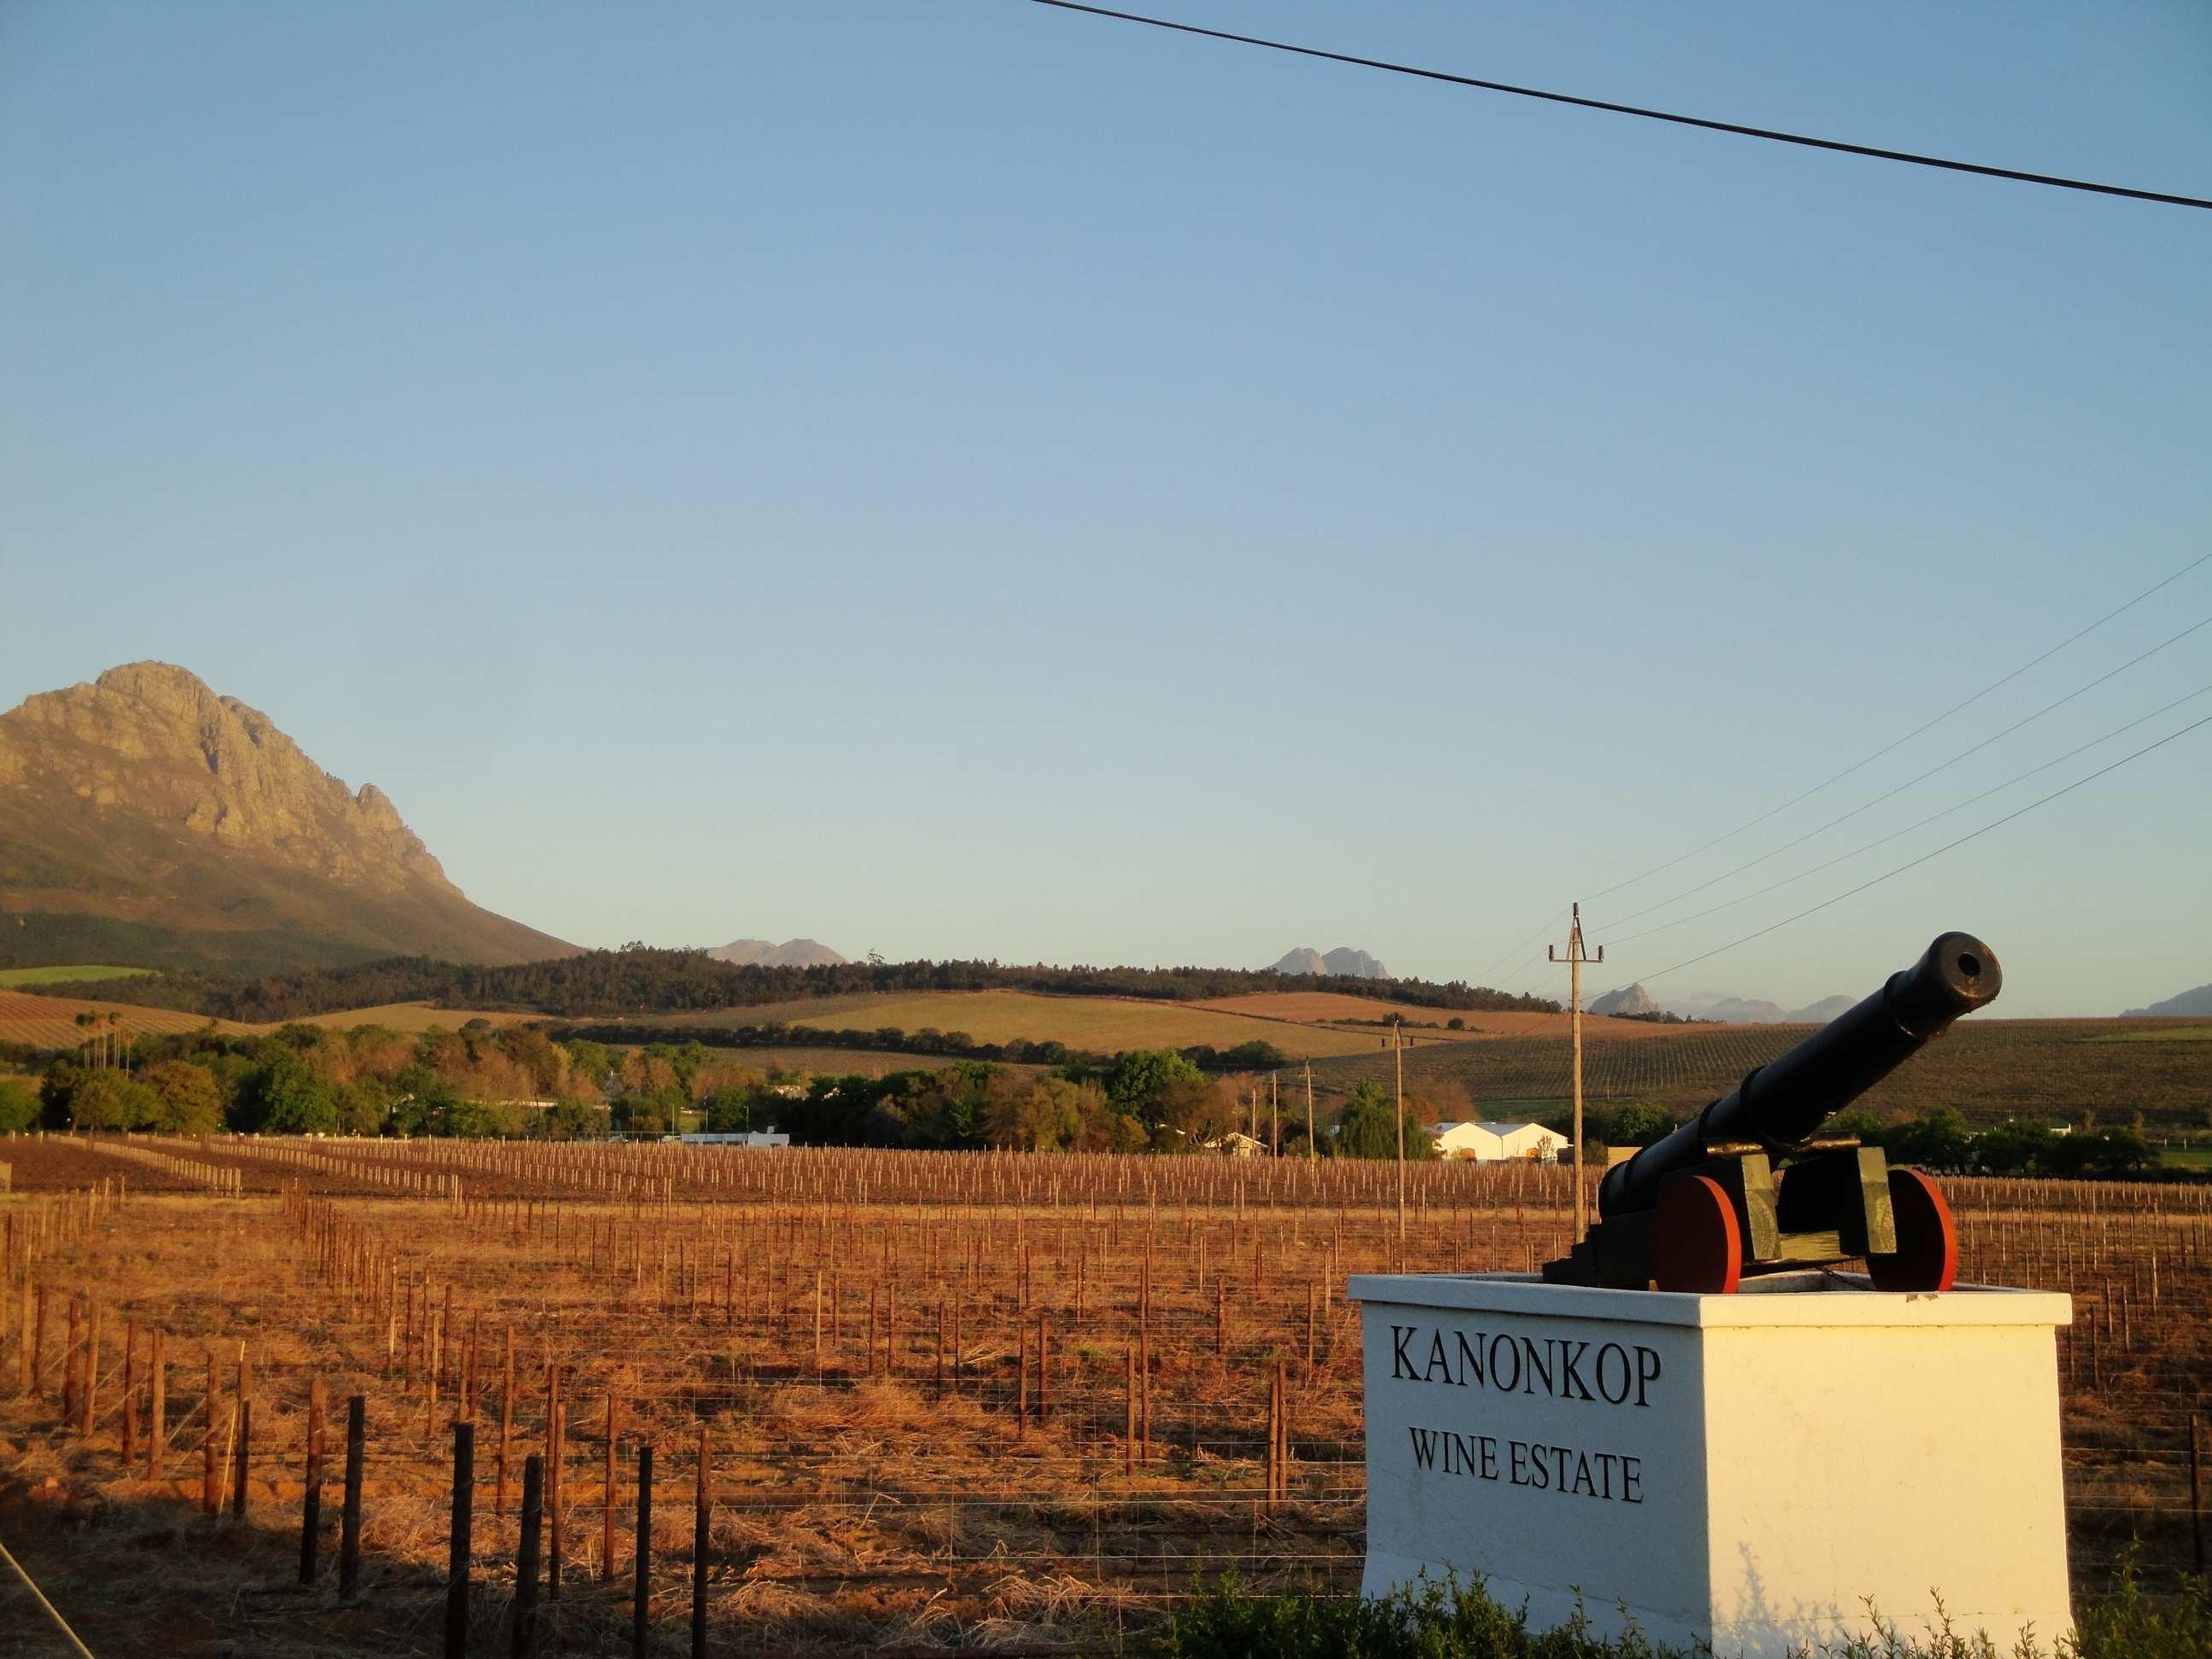 Top 10 wine farms in Cape Town